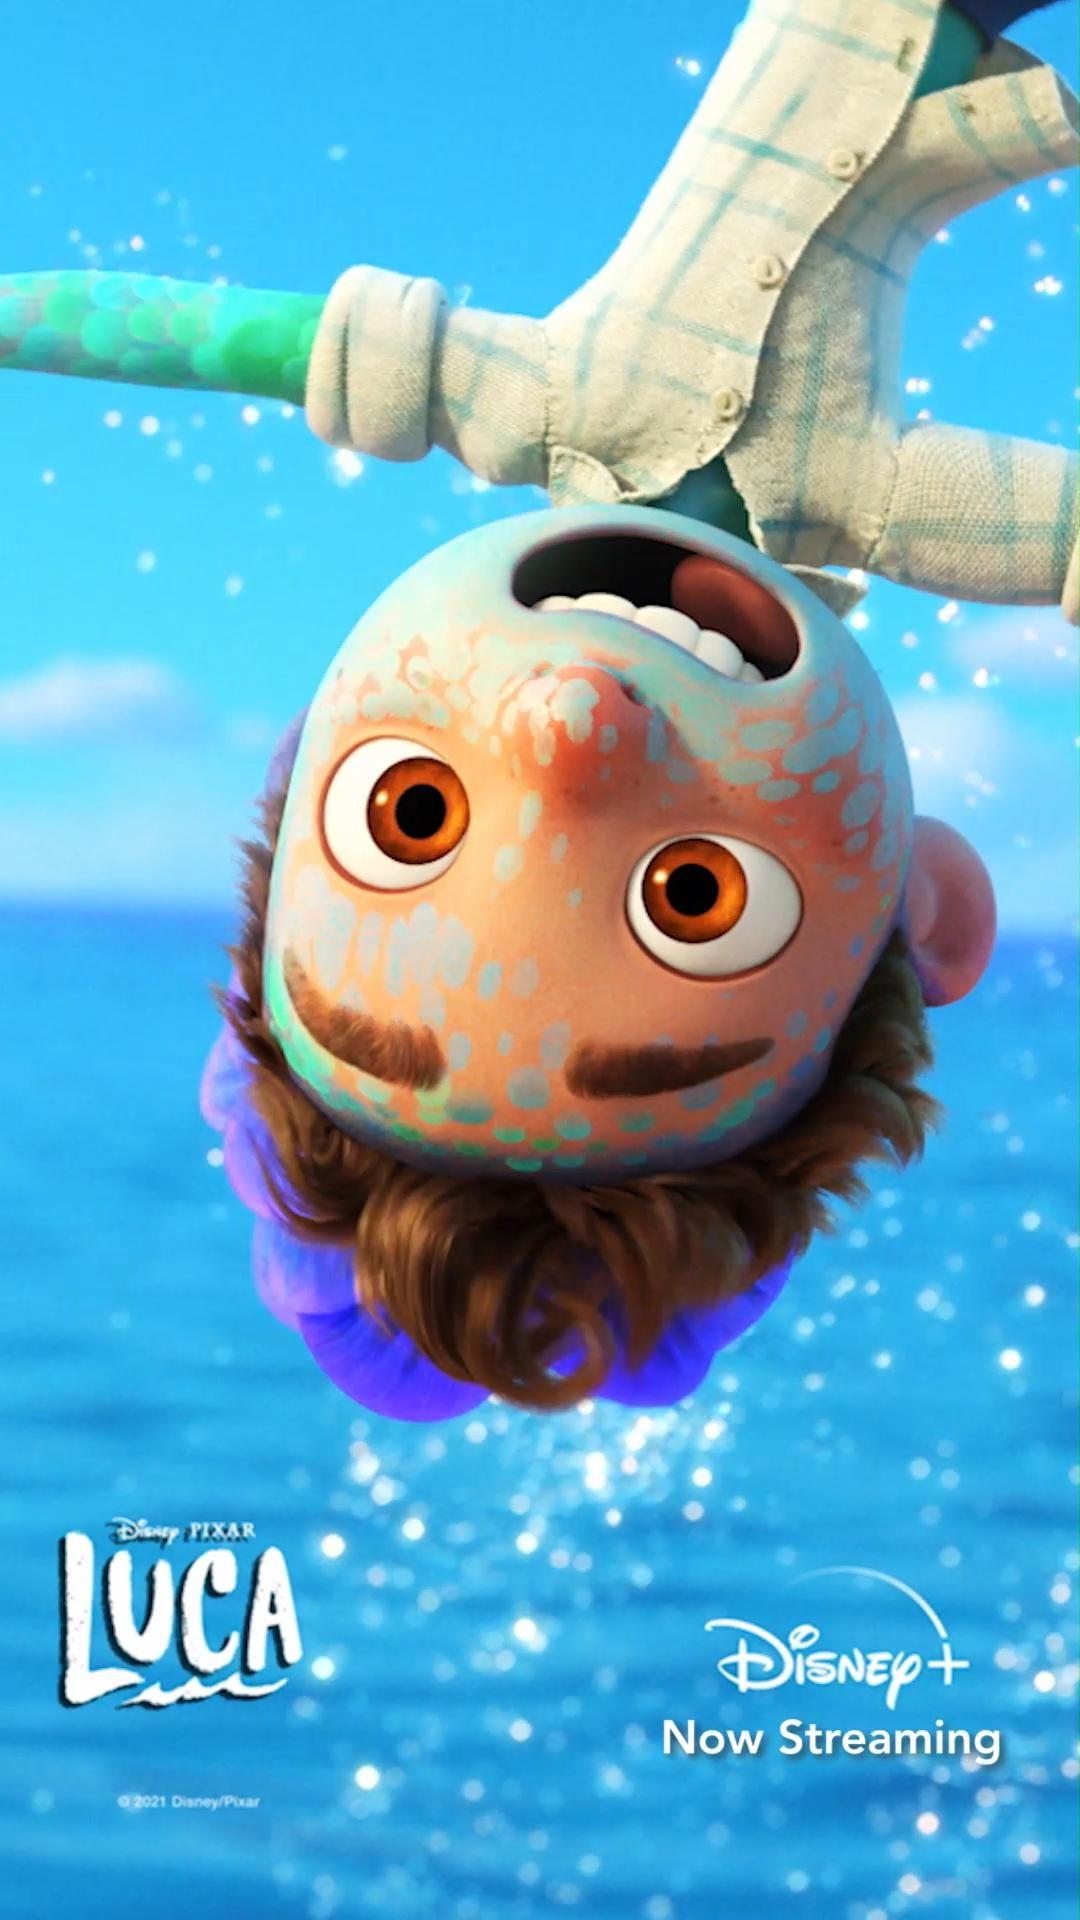 Disney And Pixar S Luca Now Streaming Video In 2021 Disney Fun Facts Pixar Disney Fun